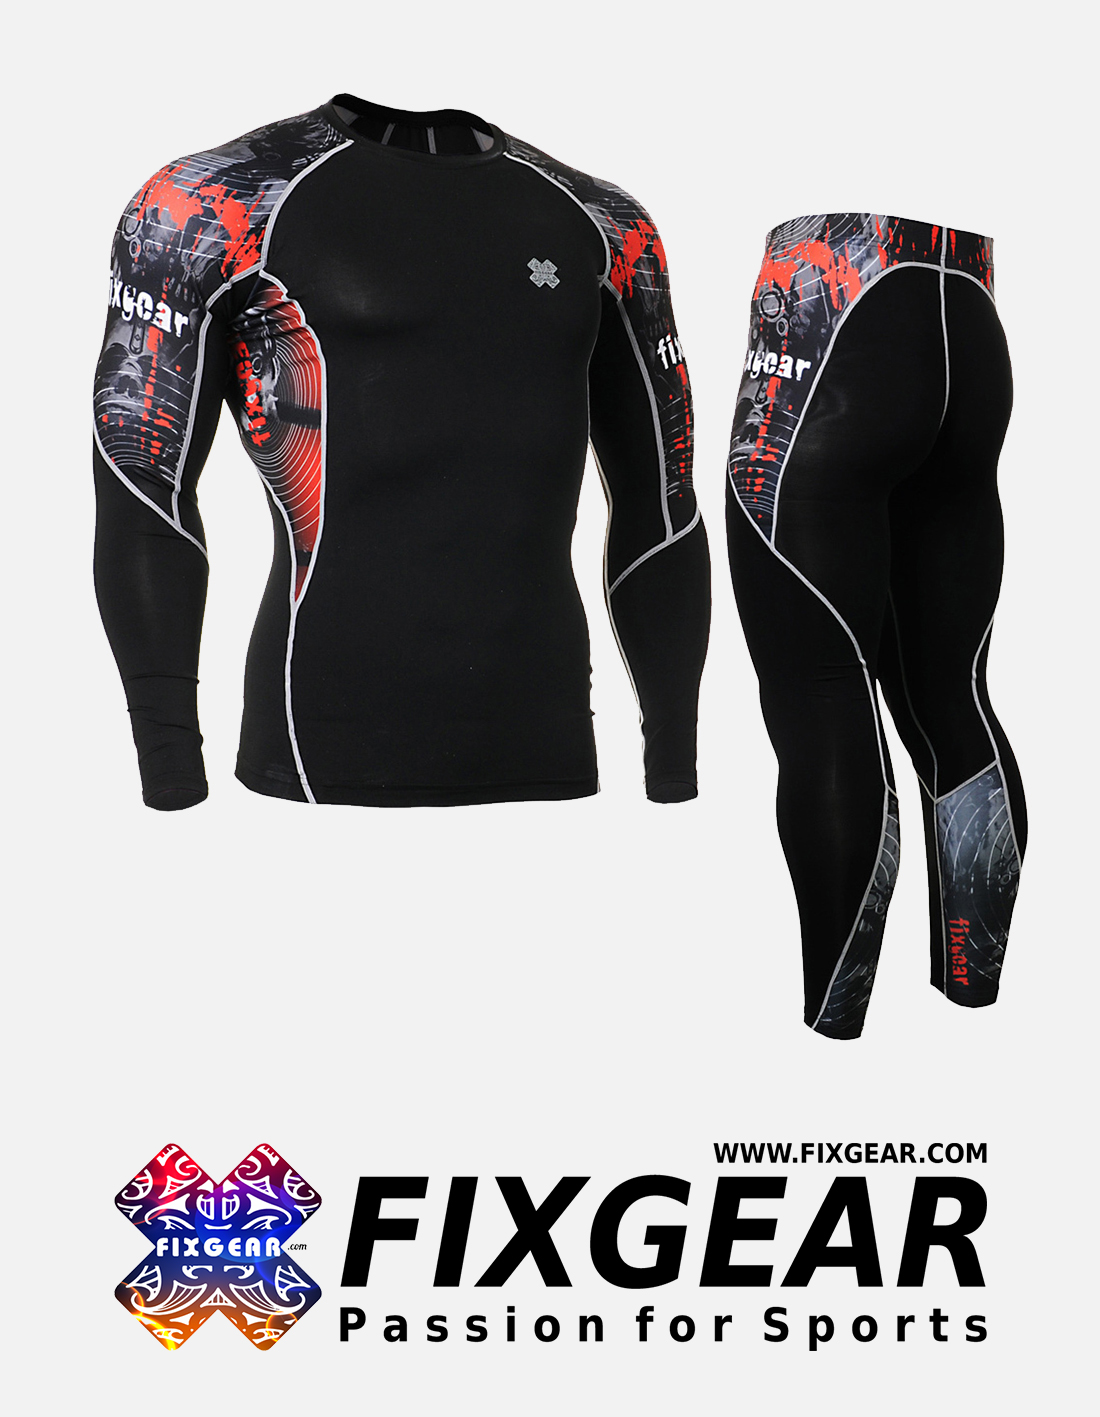 FIXGEAR C2L-P2L-B30 Set Compression Base Layer Shirt & Legging Pants